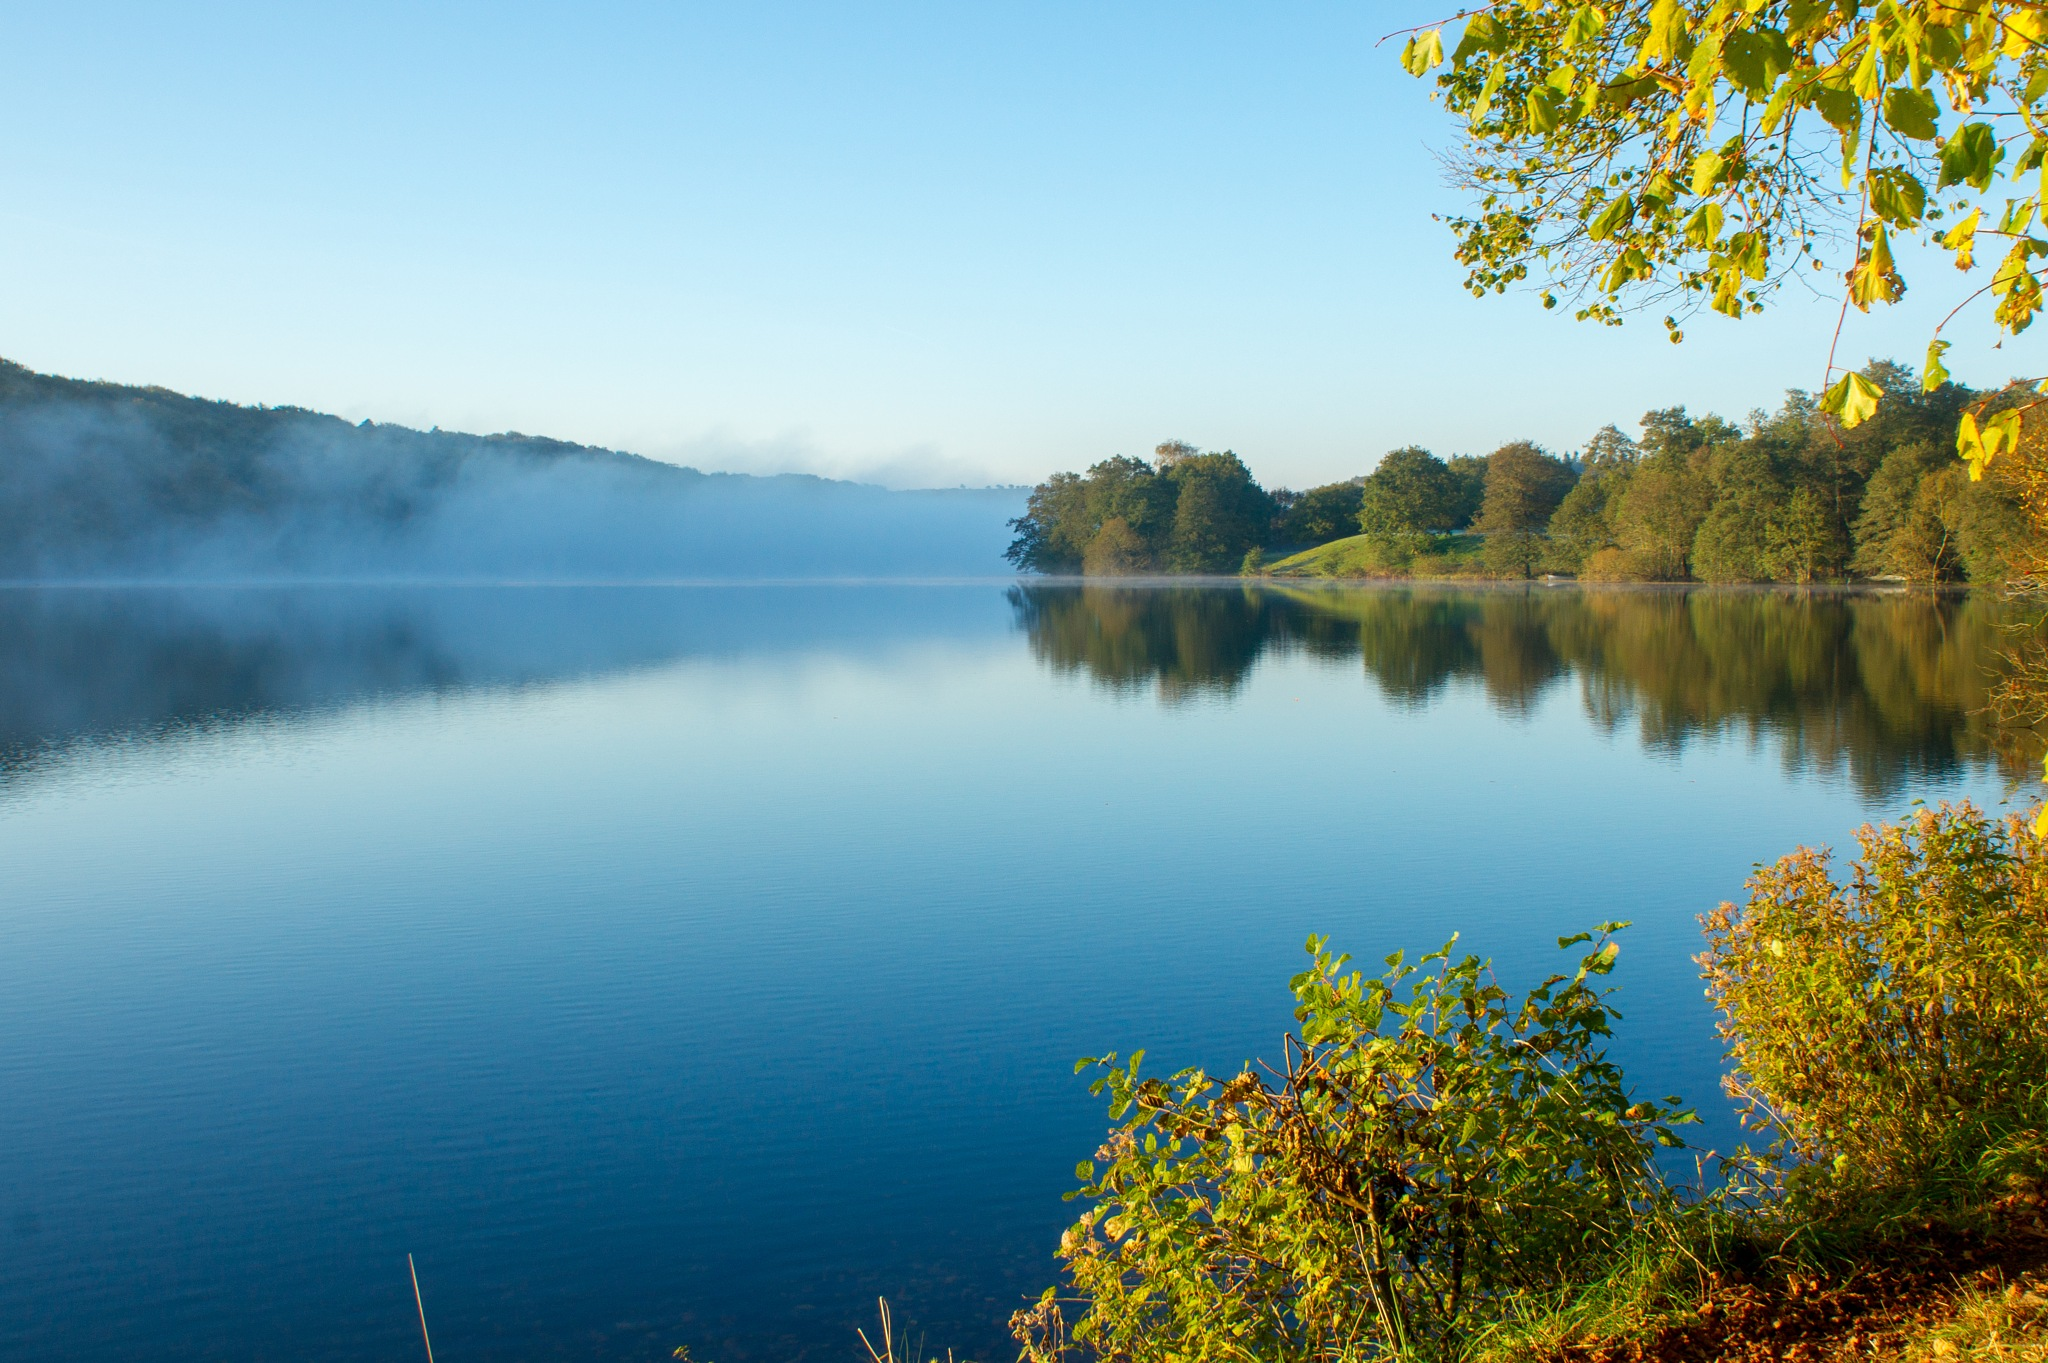 Hald Lake by Per Borring